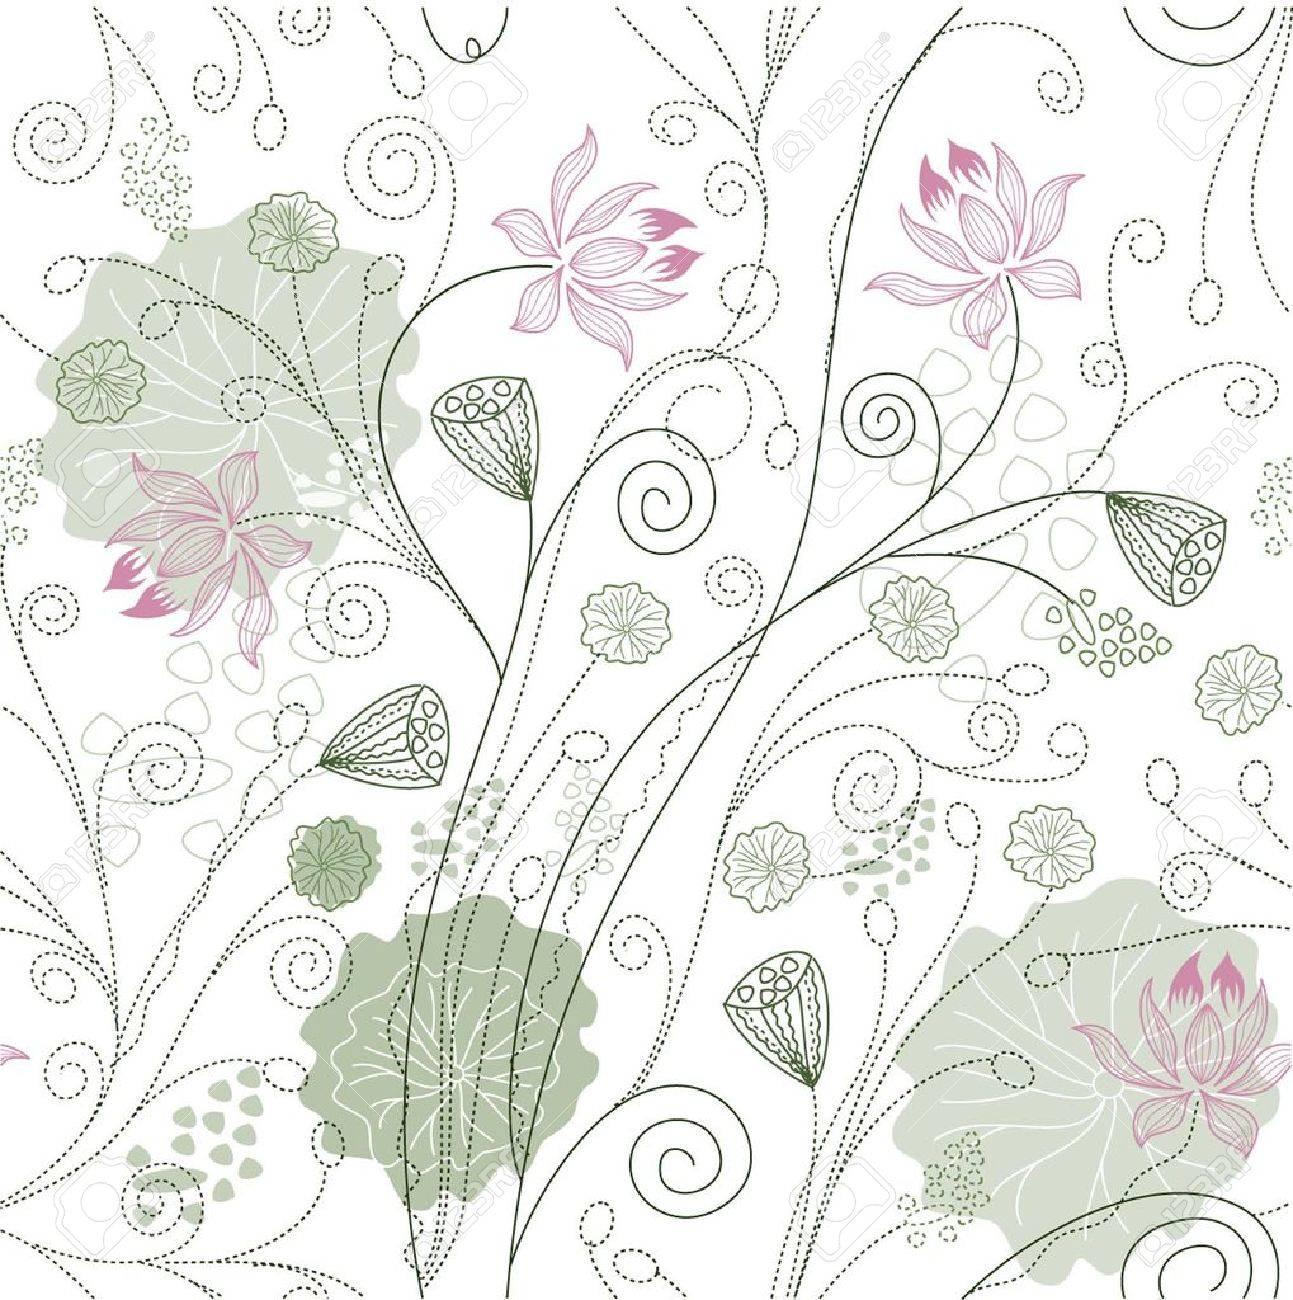 Yoga pattern background seamless pattern with five petals lotus flower - Lotus Shape Lotus Flower Pattern